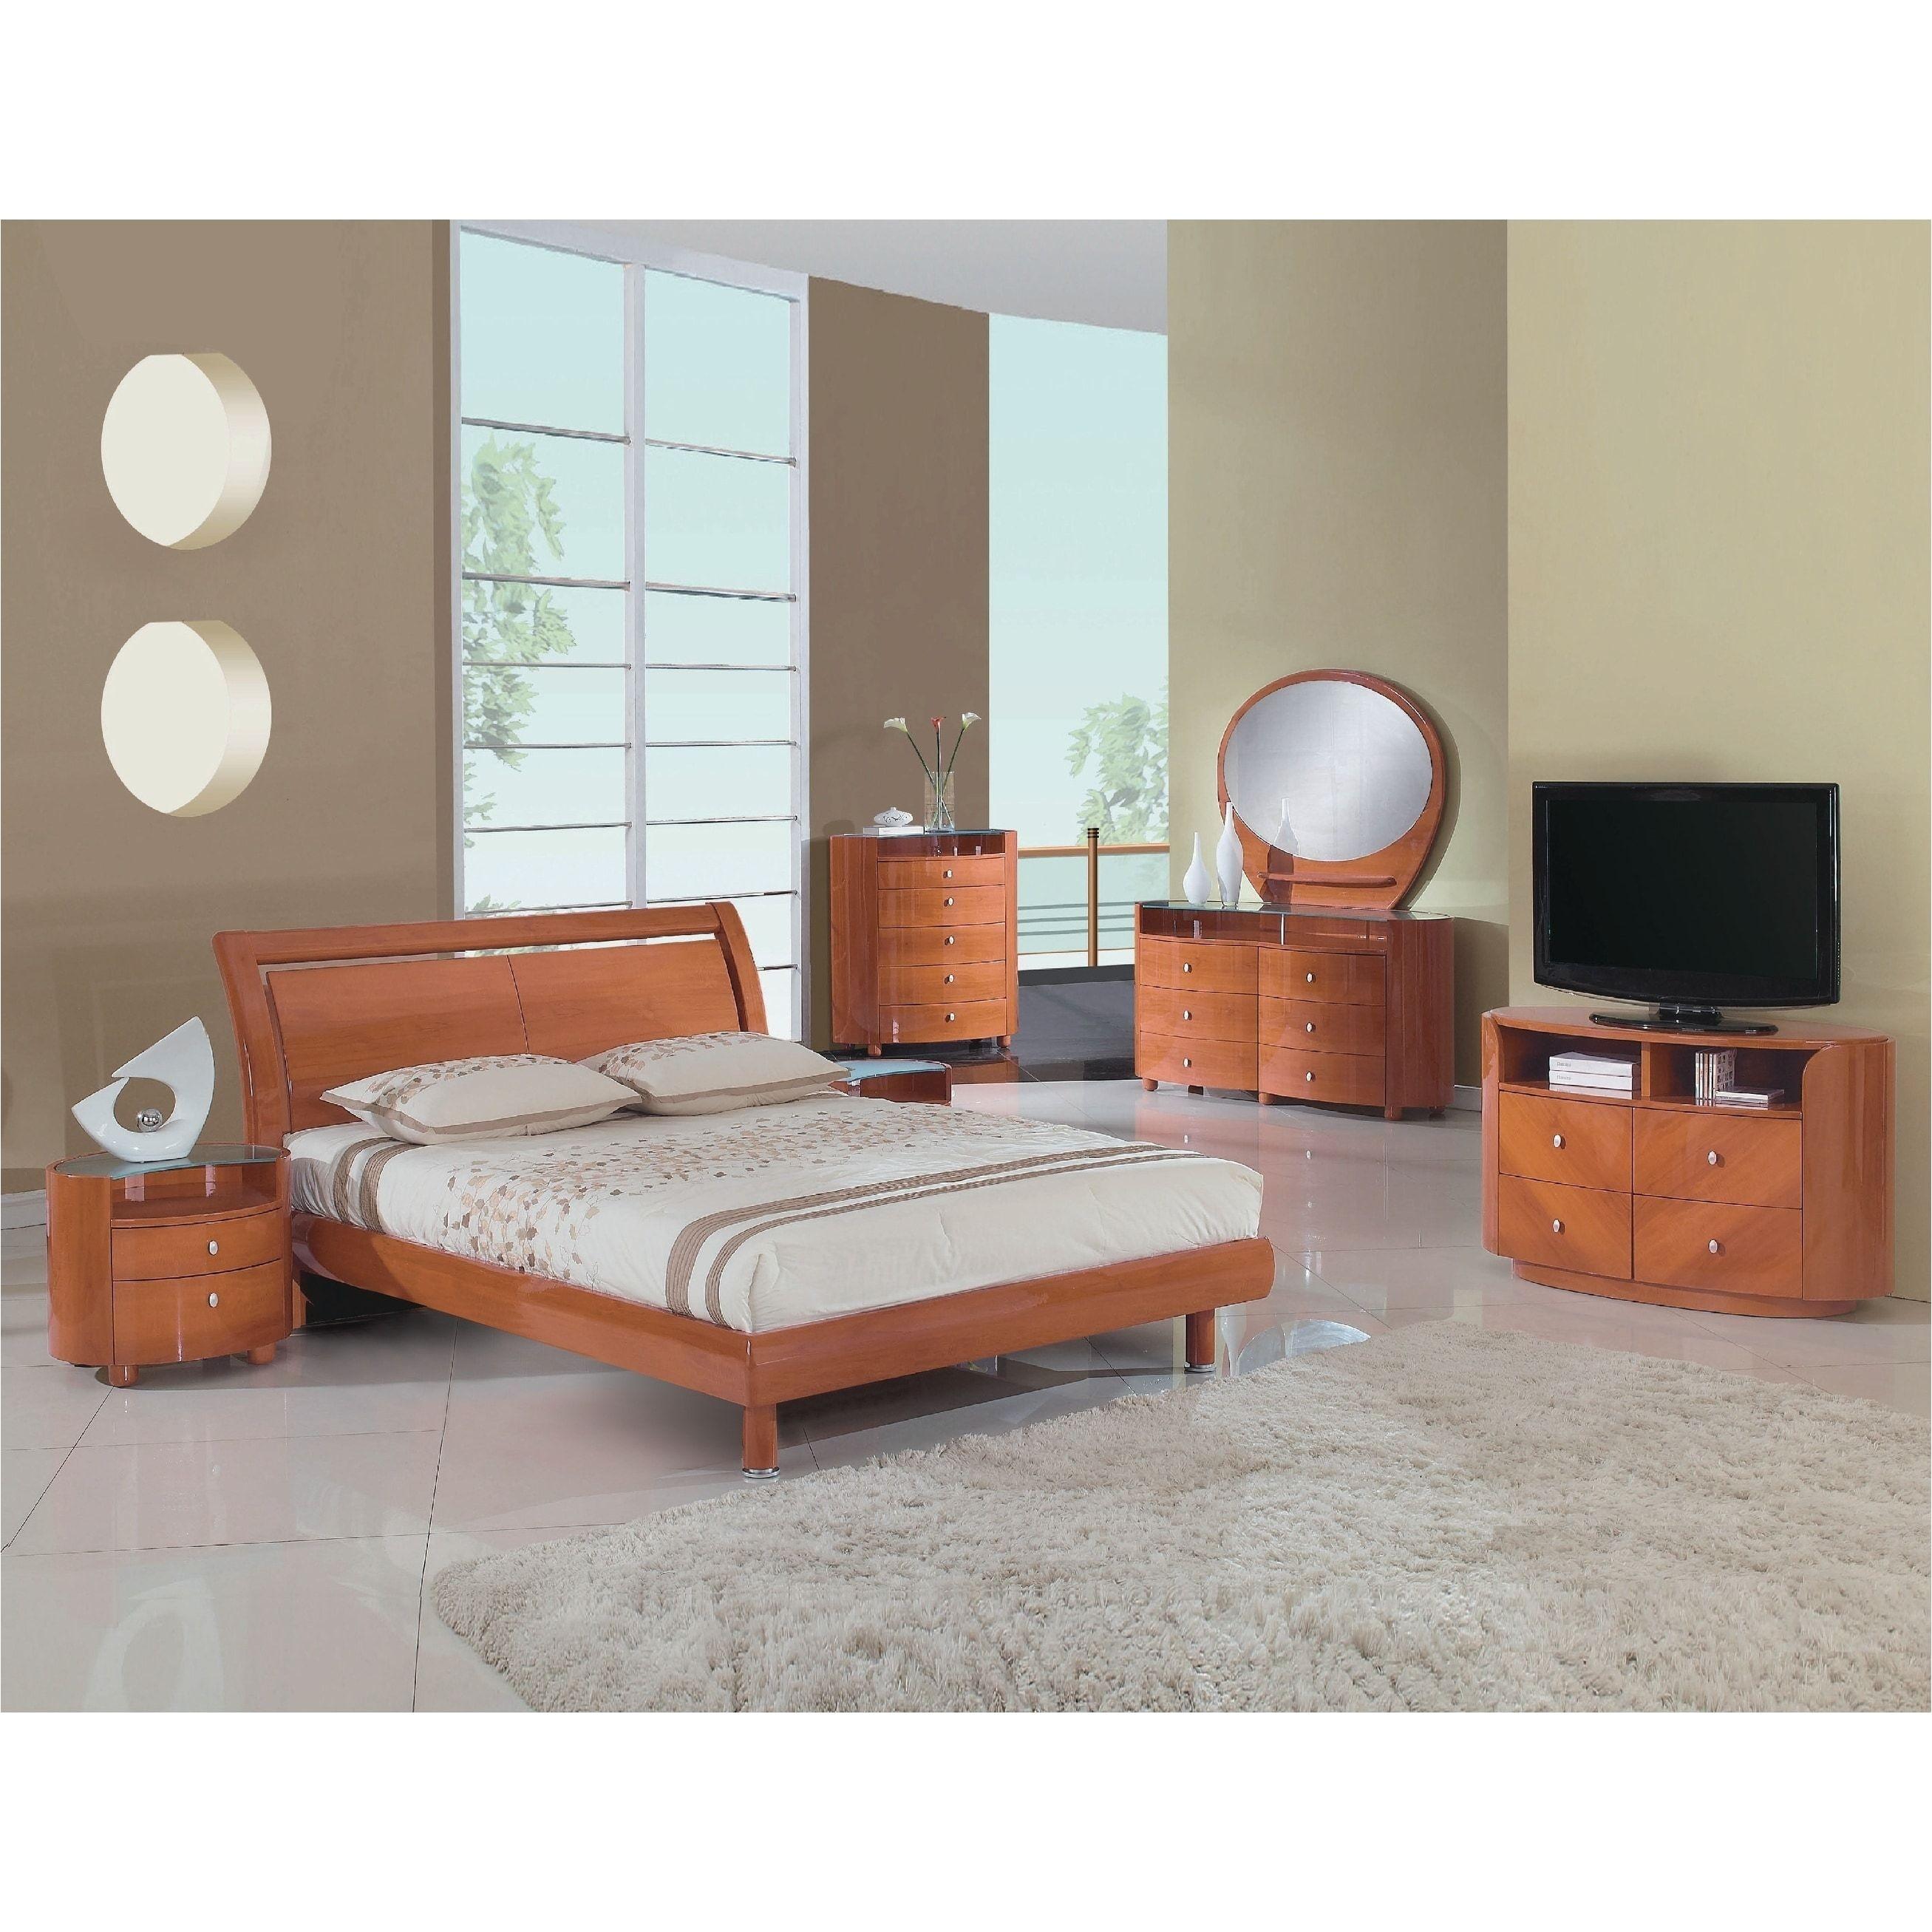 King Bedroom Sets King Bedroom Sets Elegant King Bedroom Set Beautiful Brown Bedroom